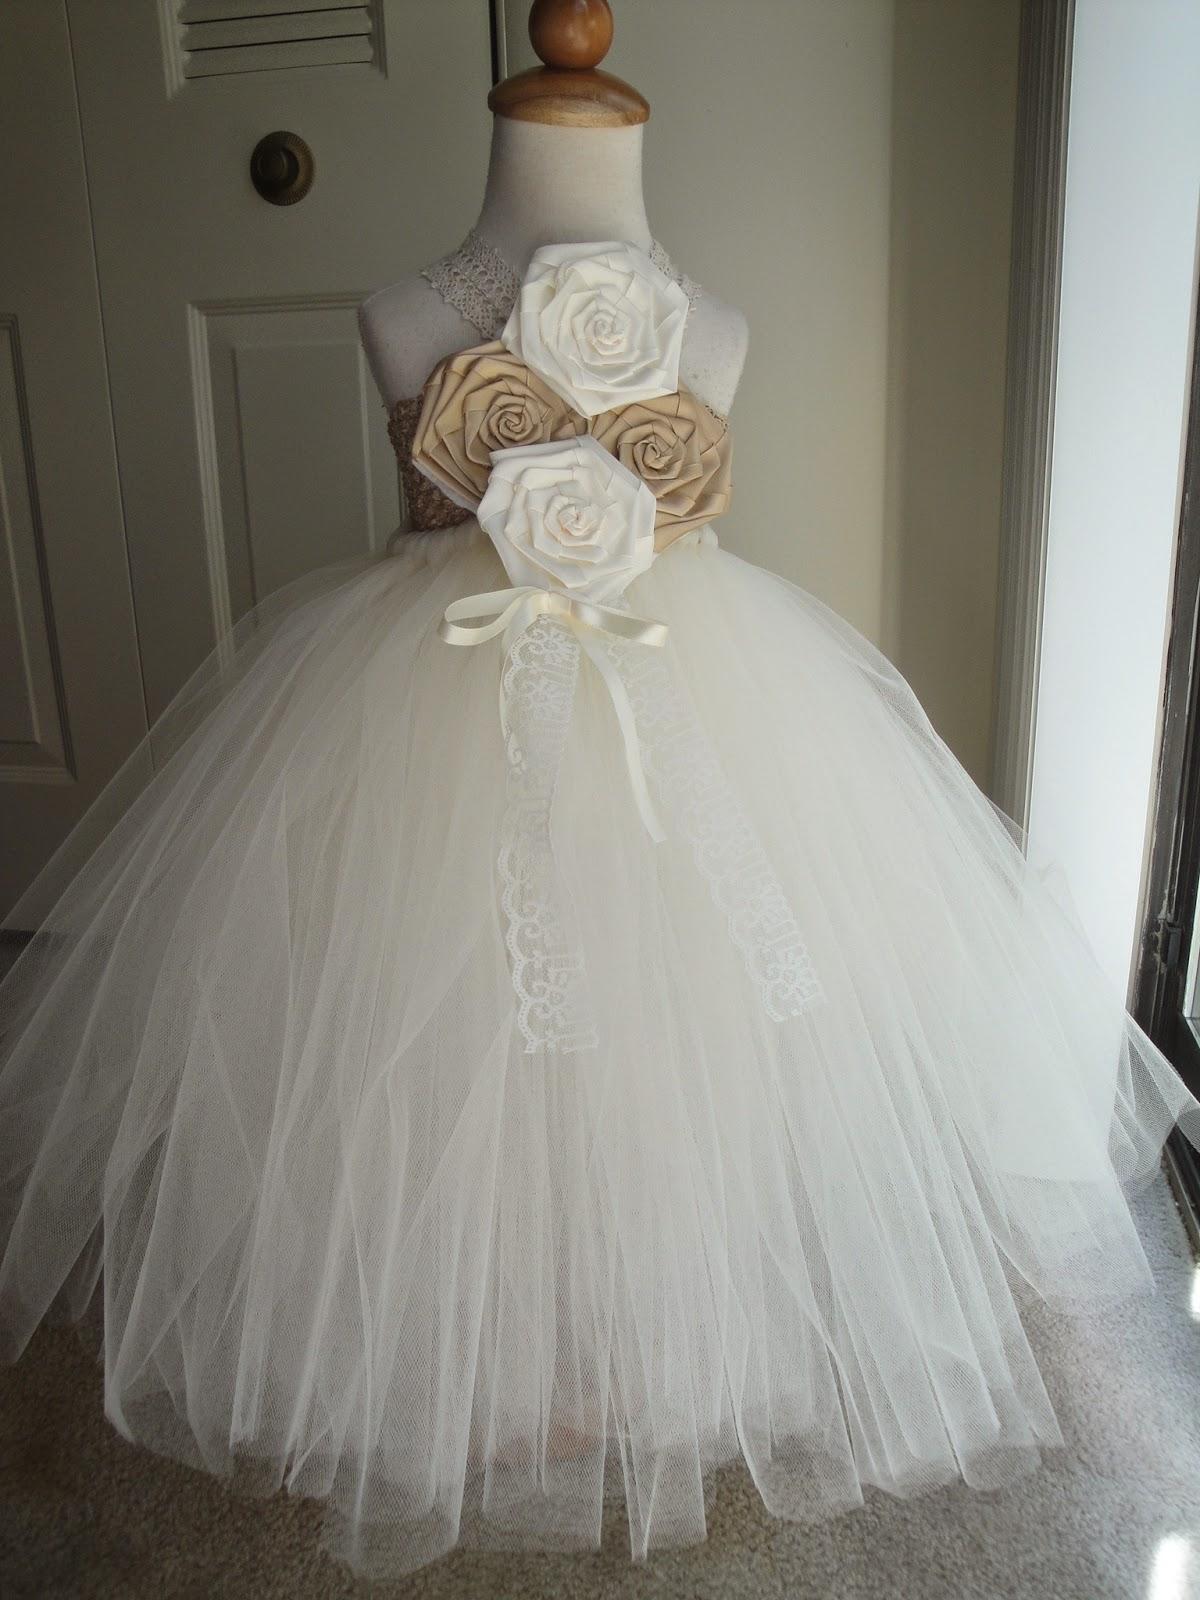 Hollywoodtutu dresses Rustic flower girl tutu dress